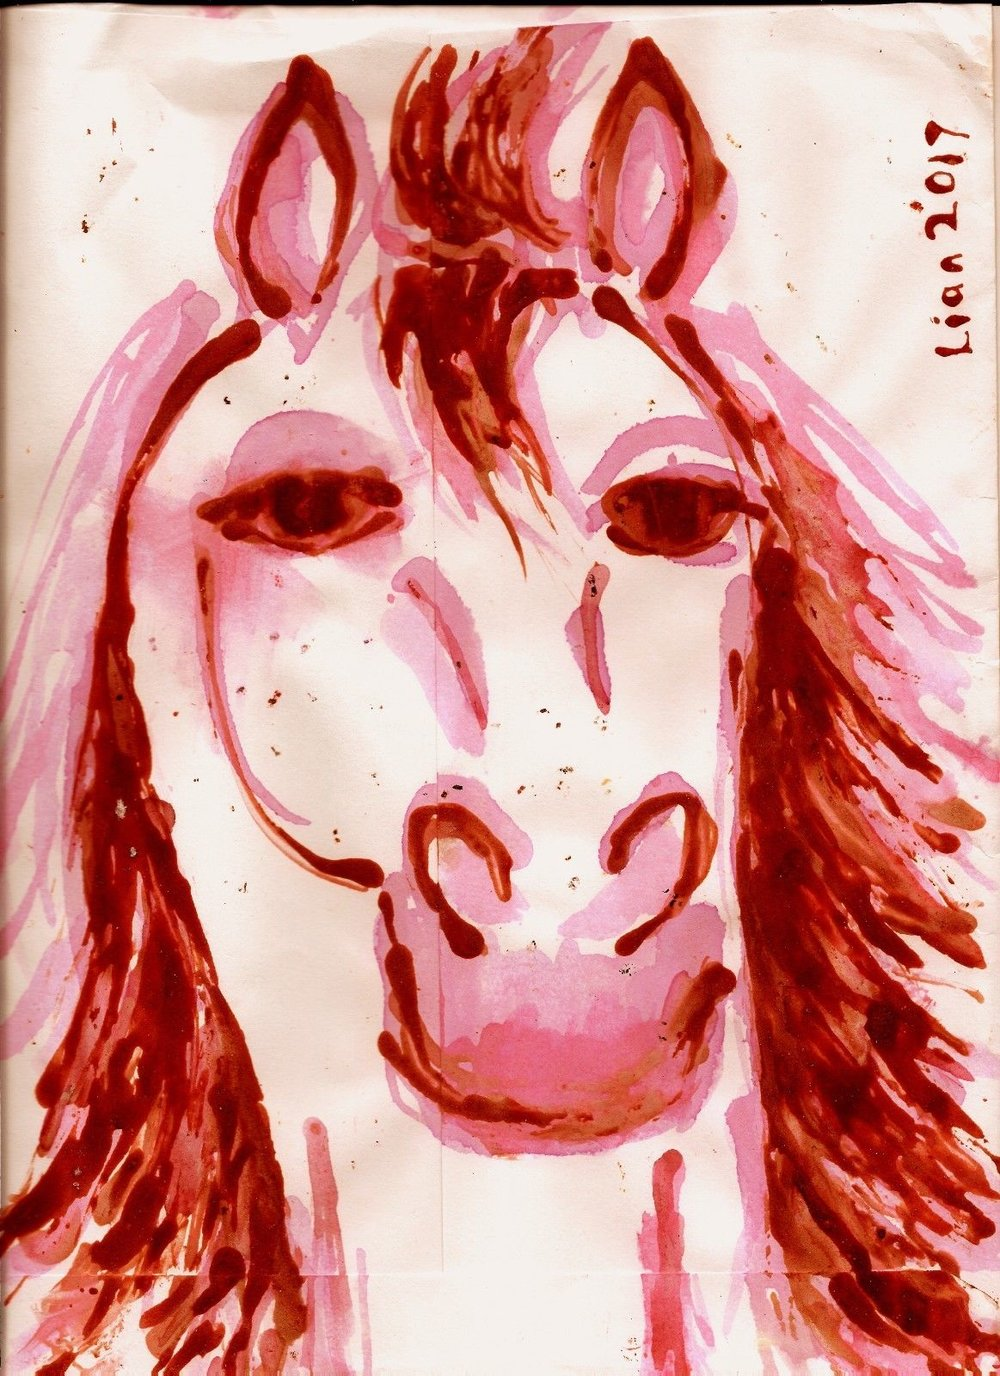 Lian Kool Aid art on manila envelope f.jpg